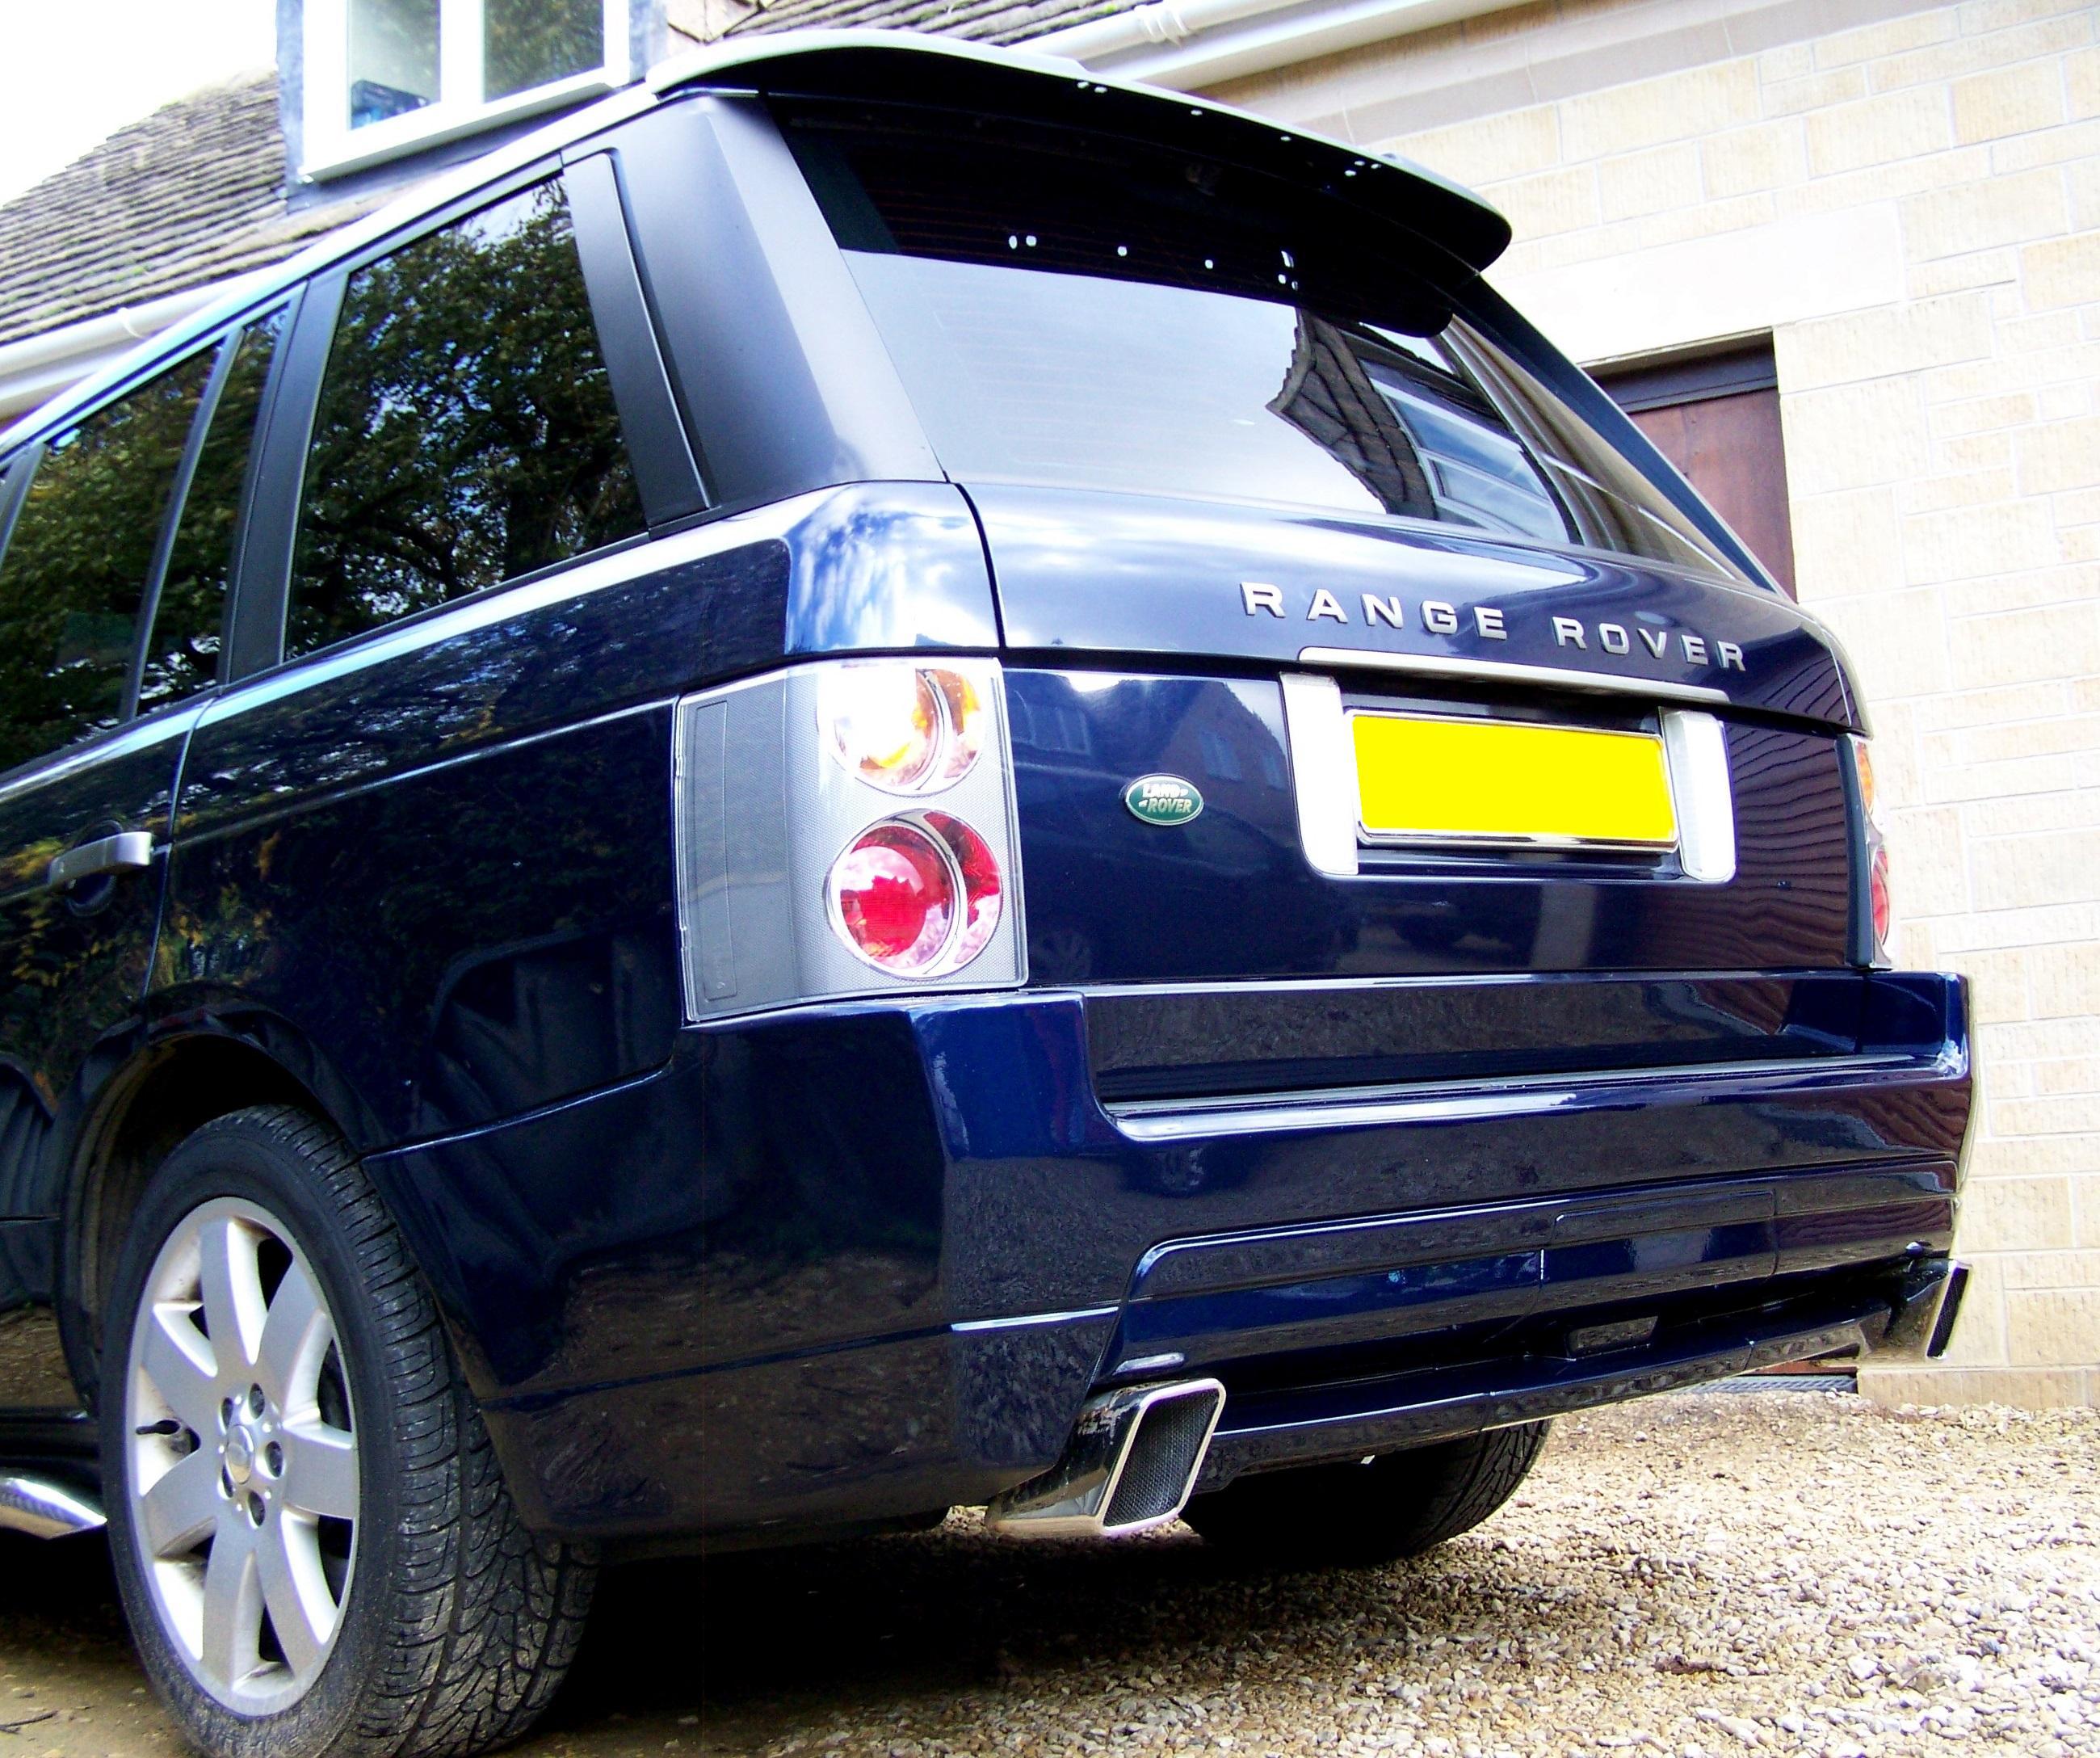 Complete Rear Bumper Bodykit For Range Rover L322 2002